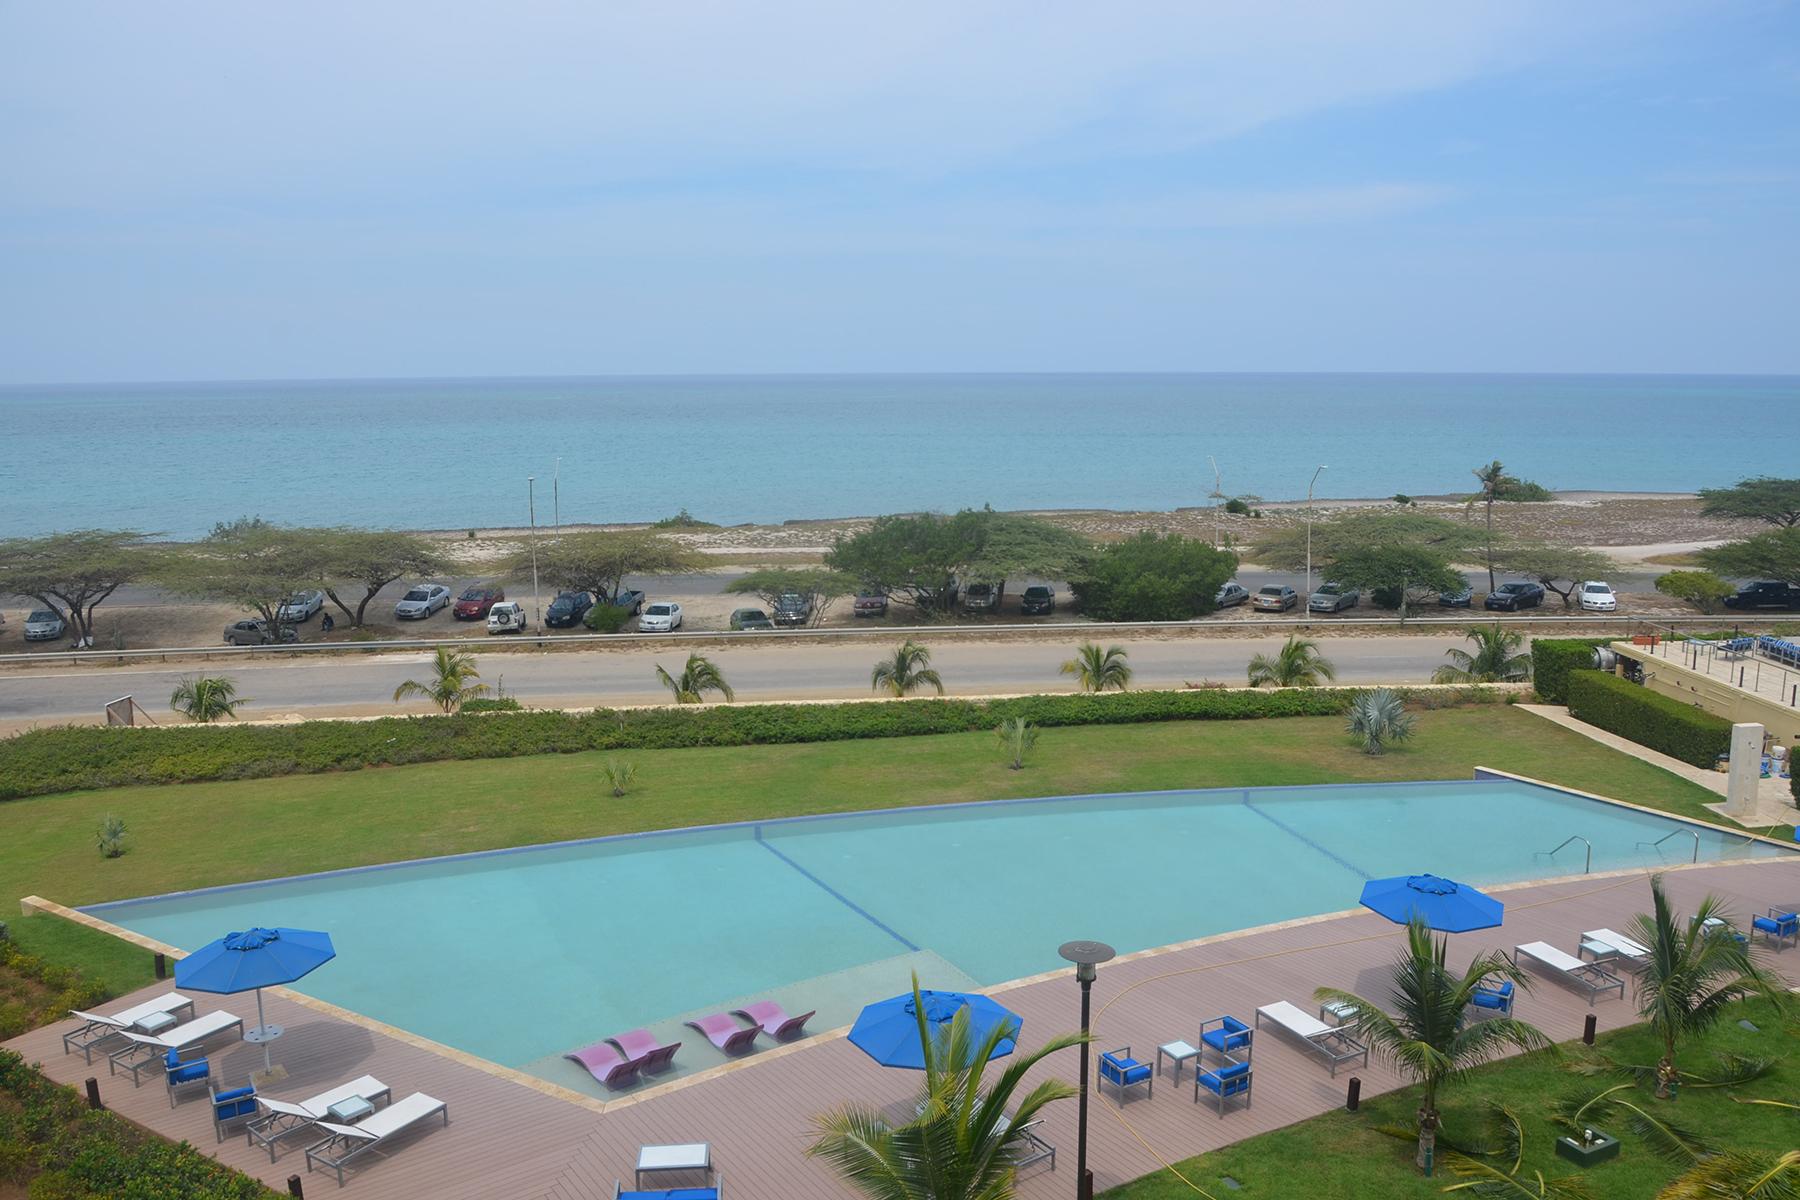 Condominium for Sale at Blue Residence #434 Eagle Beach, Aruba Aruba